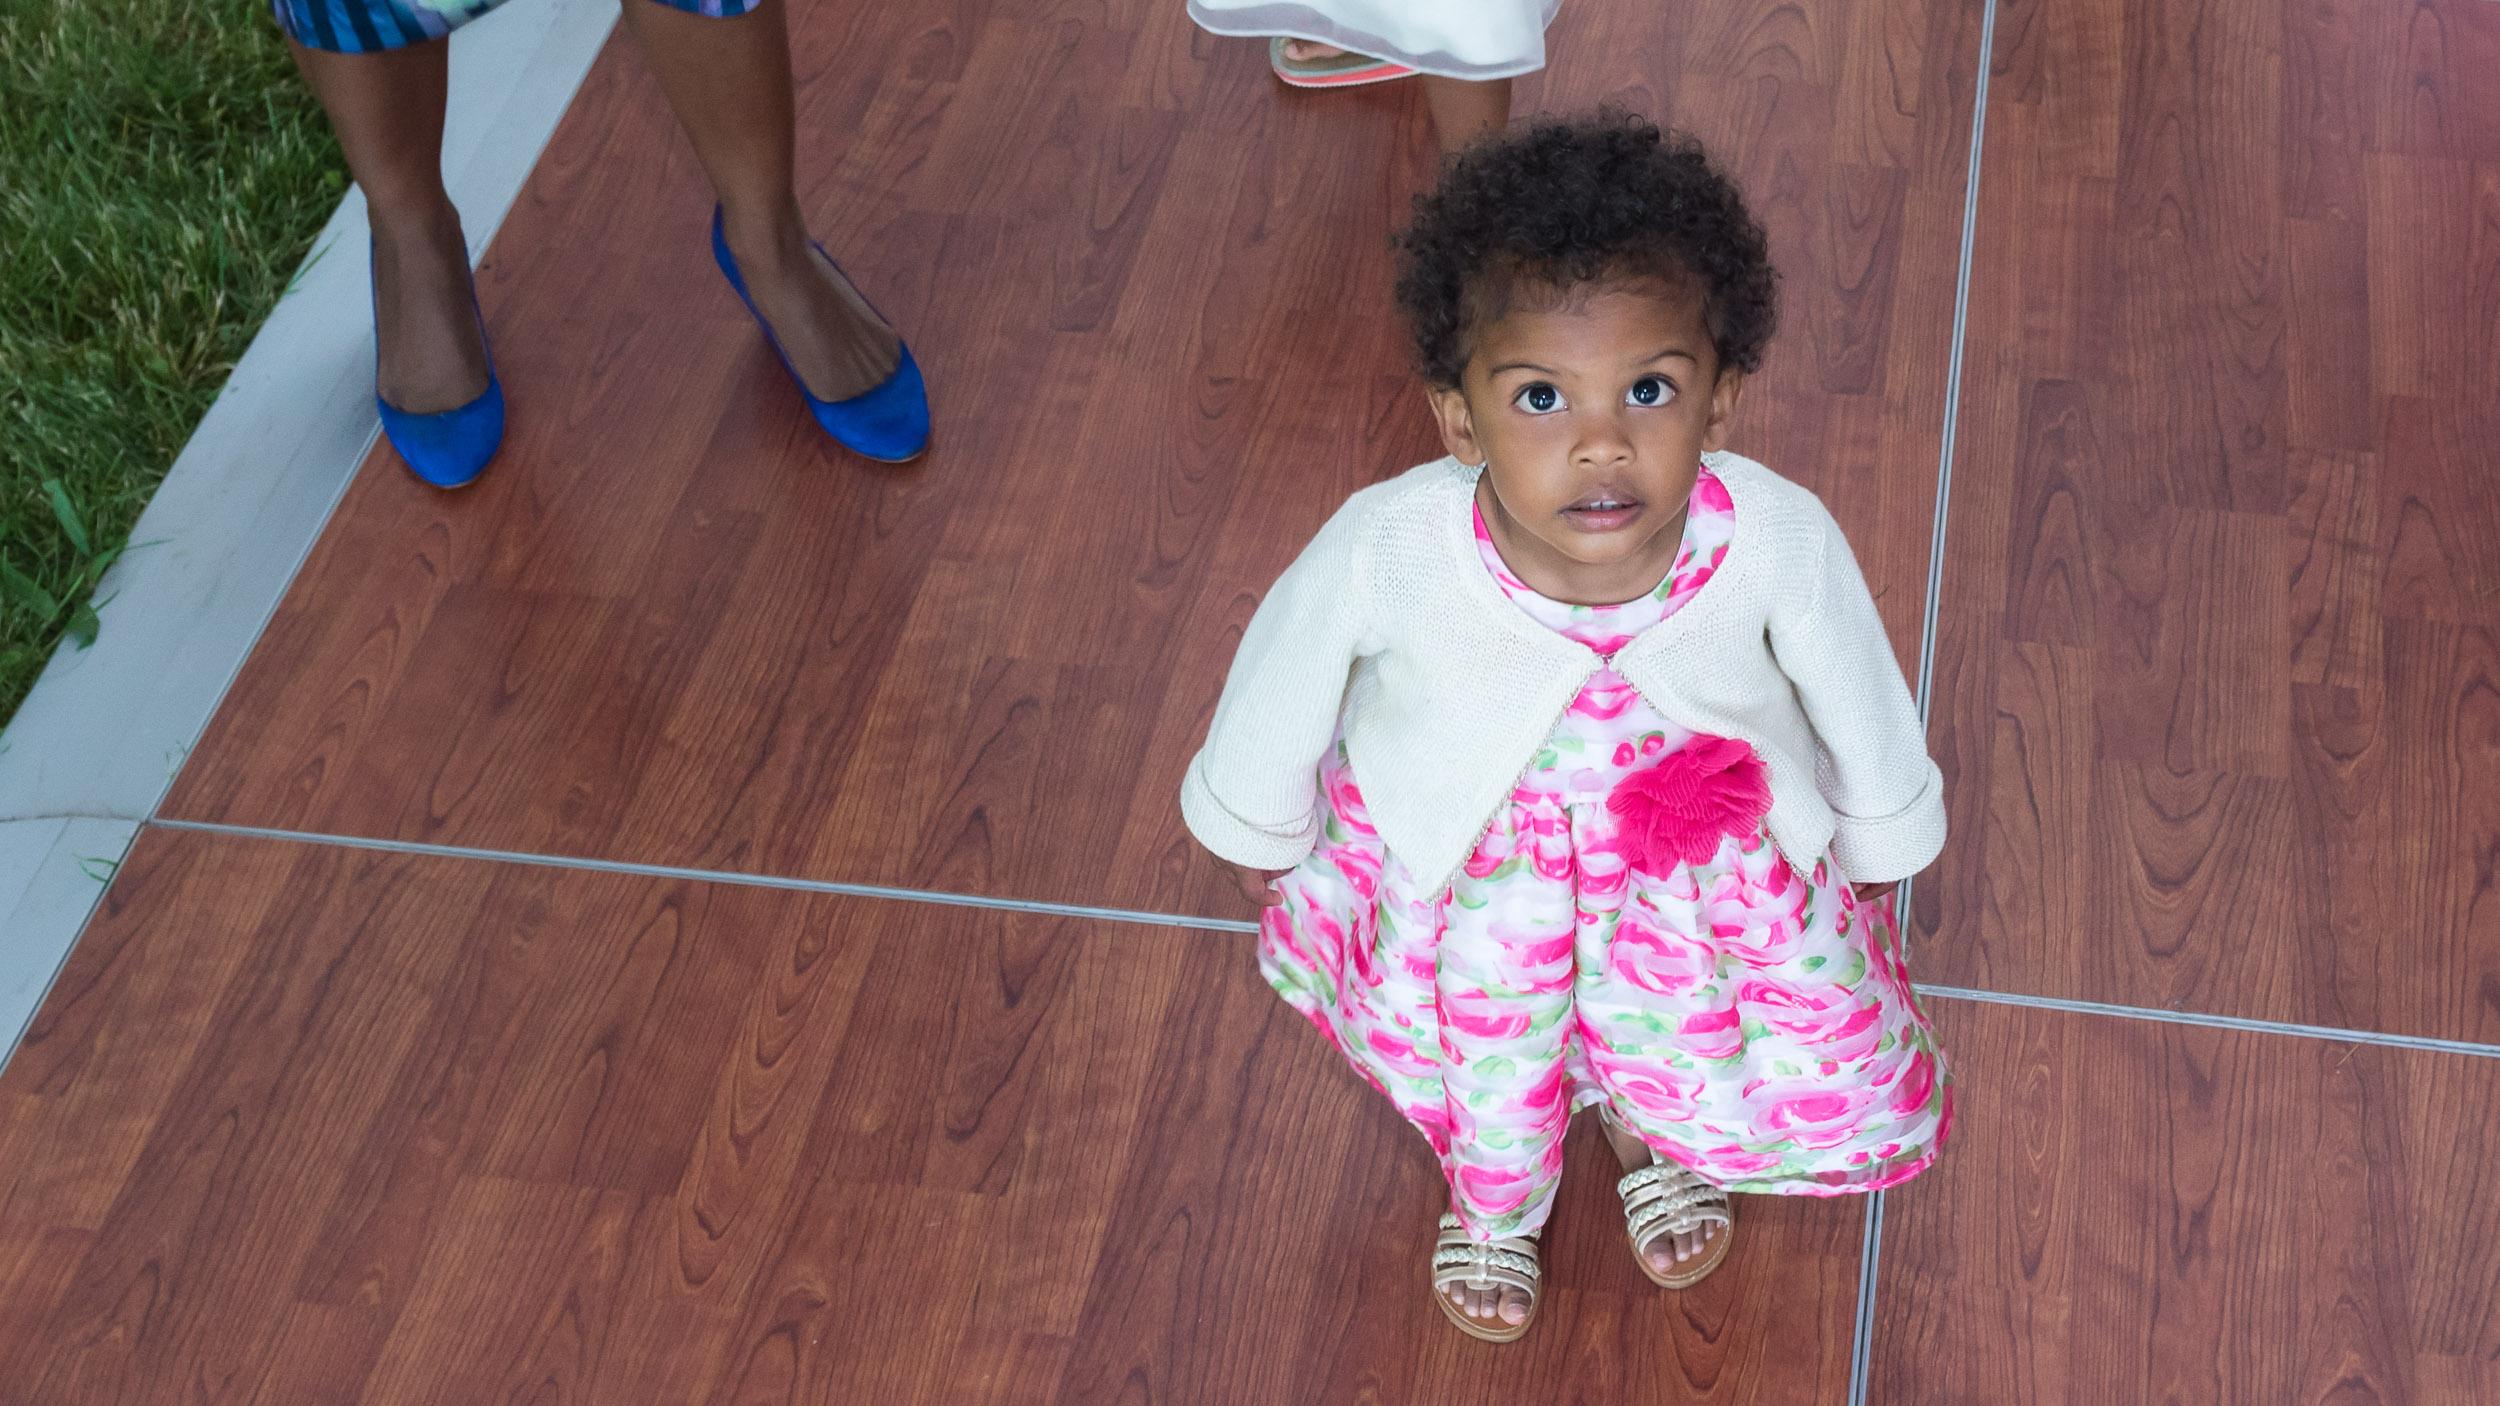 Wedding-reception-little-girl-on-dance-floor.jpg